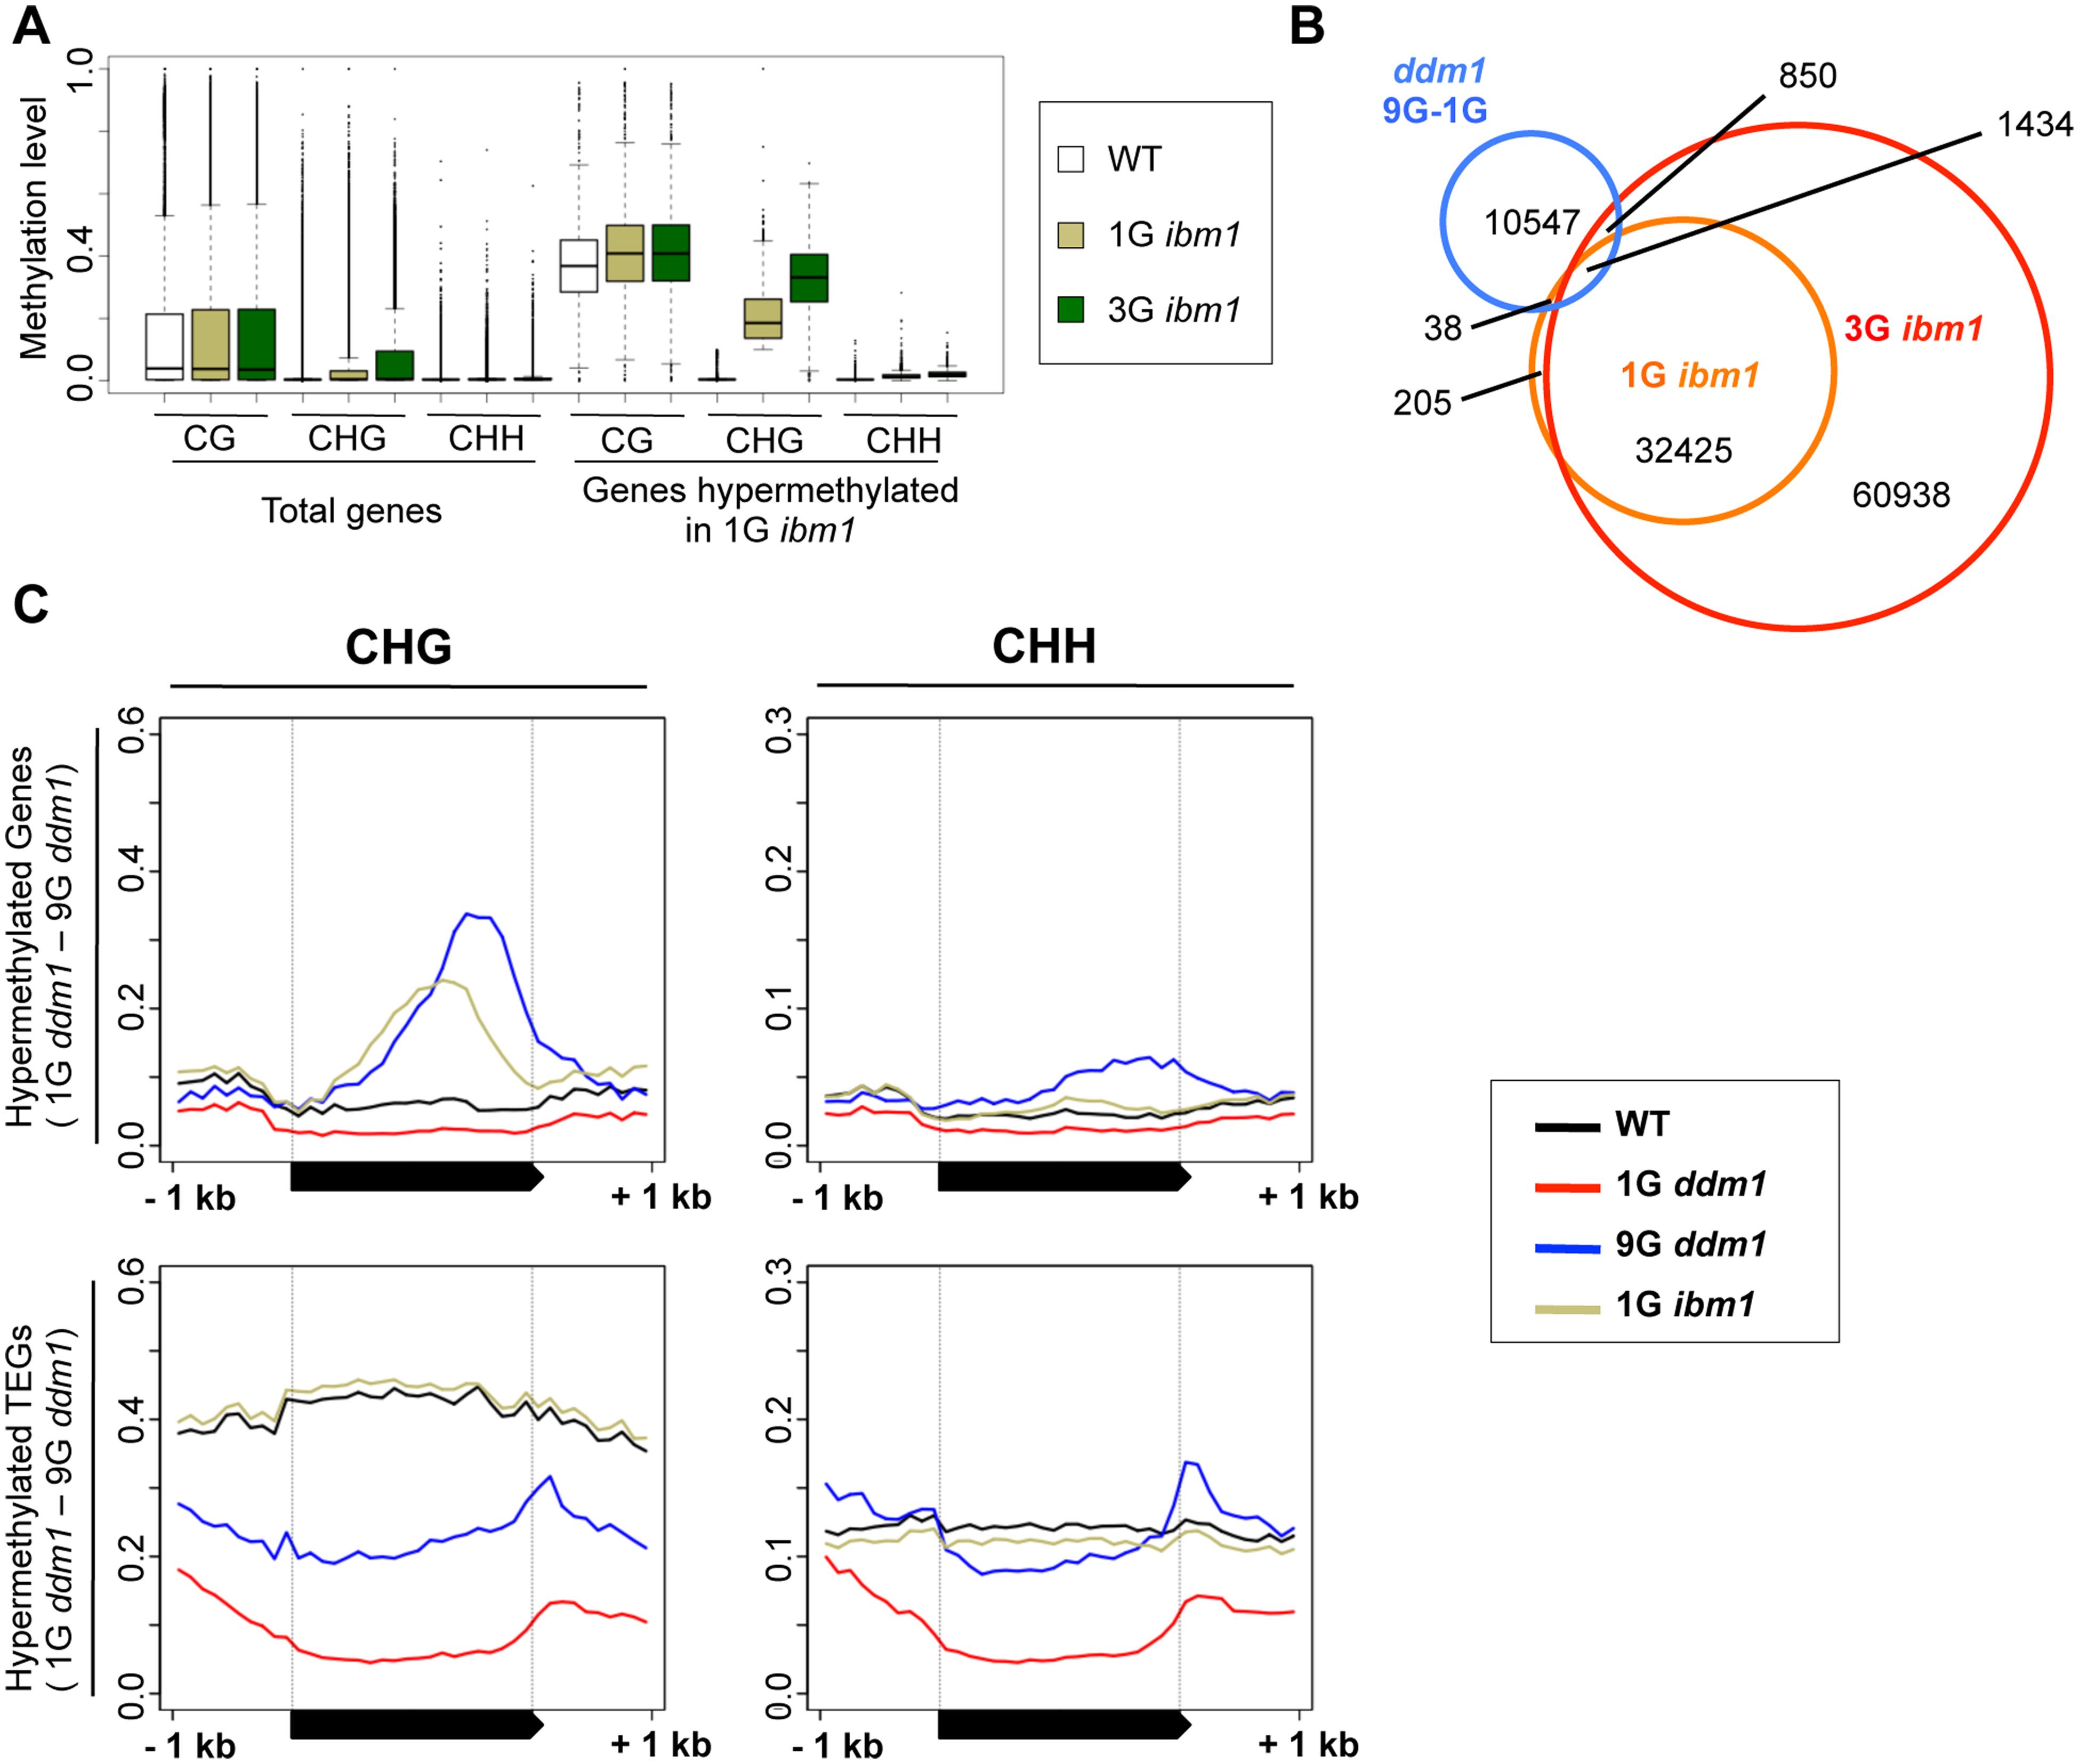 Hypermethylated regions in <i>ddm1</i> and <i>ibm1</i> mutants.